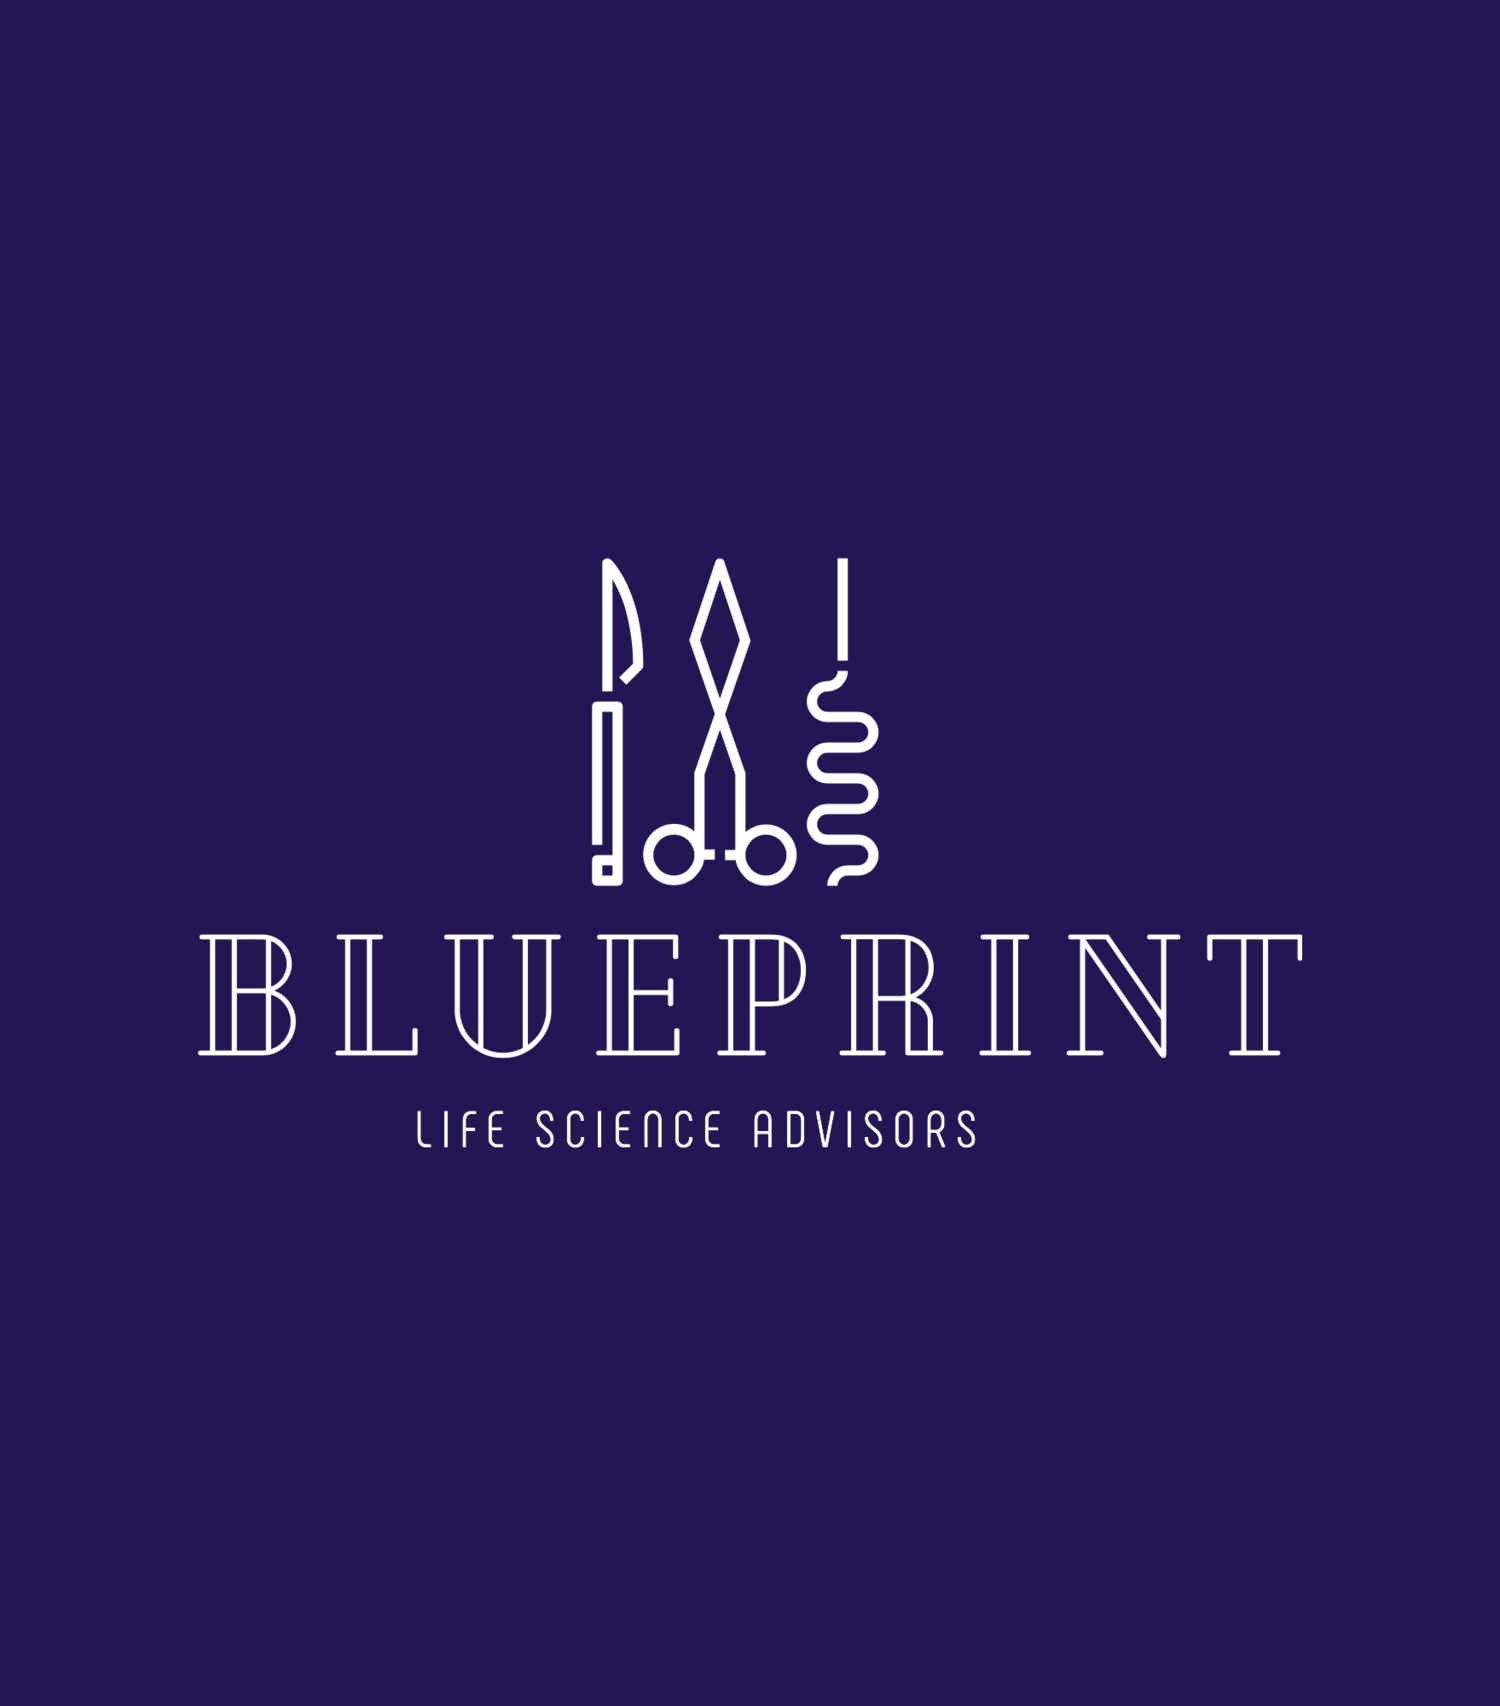 Blueprint blueprint life science advisors malvernweather Gallery